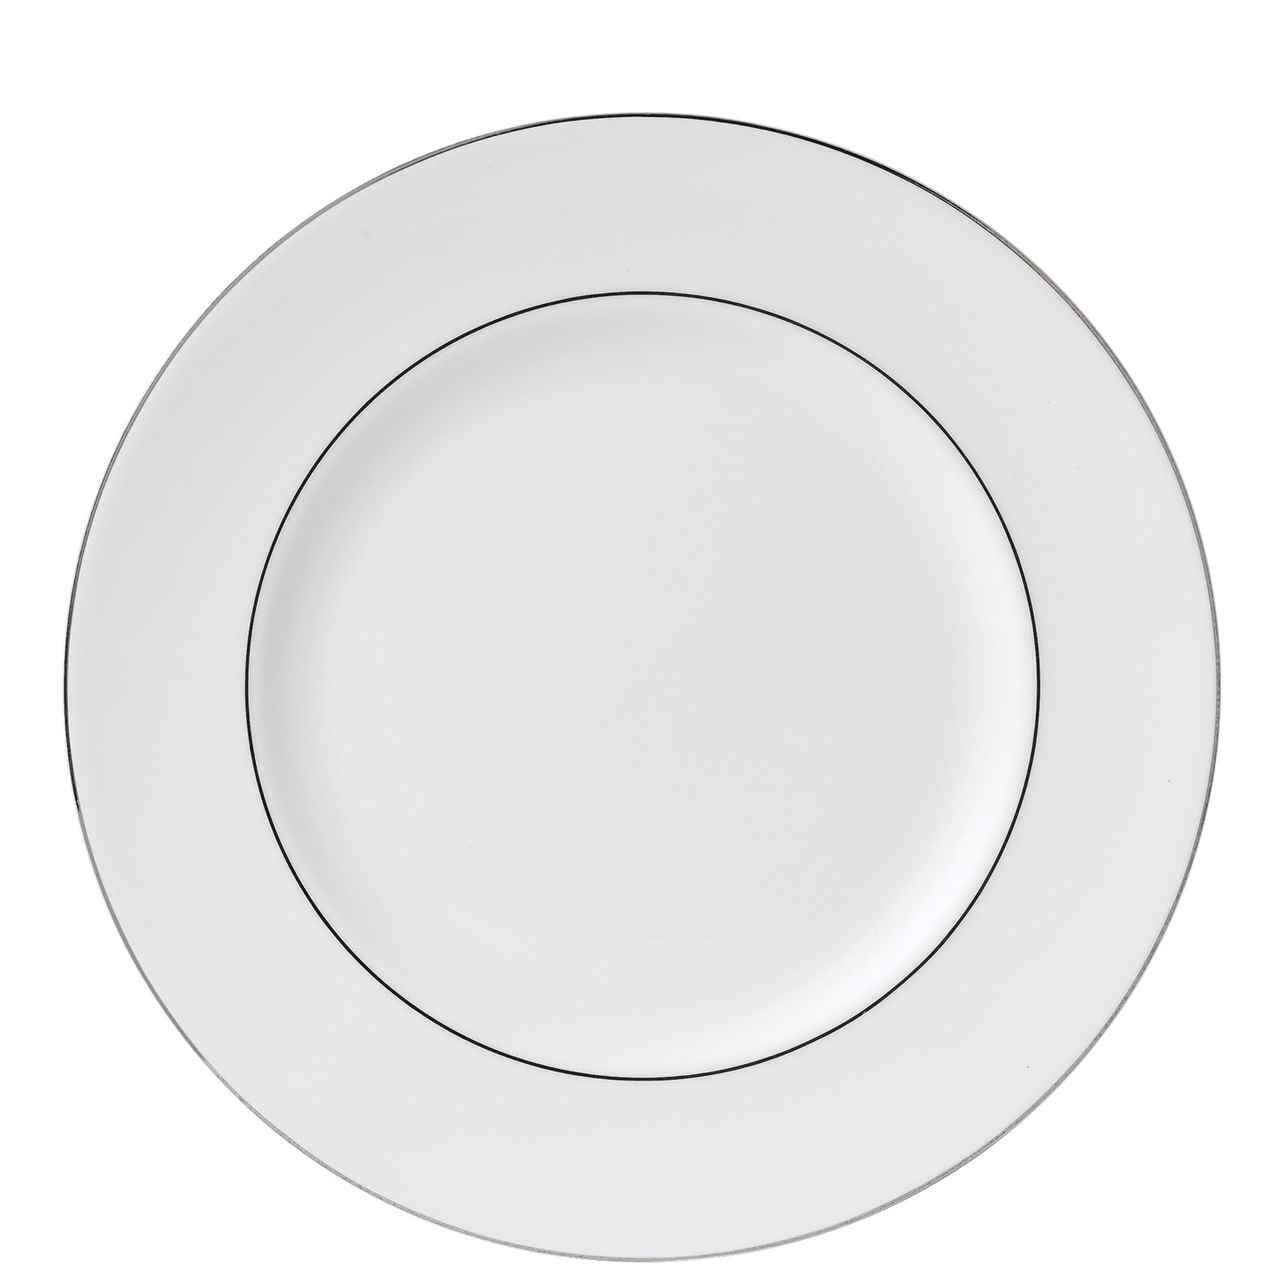 Signet Platinum Dinner Plate 27cm